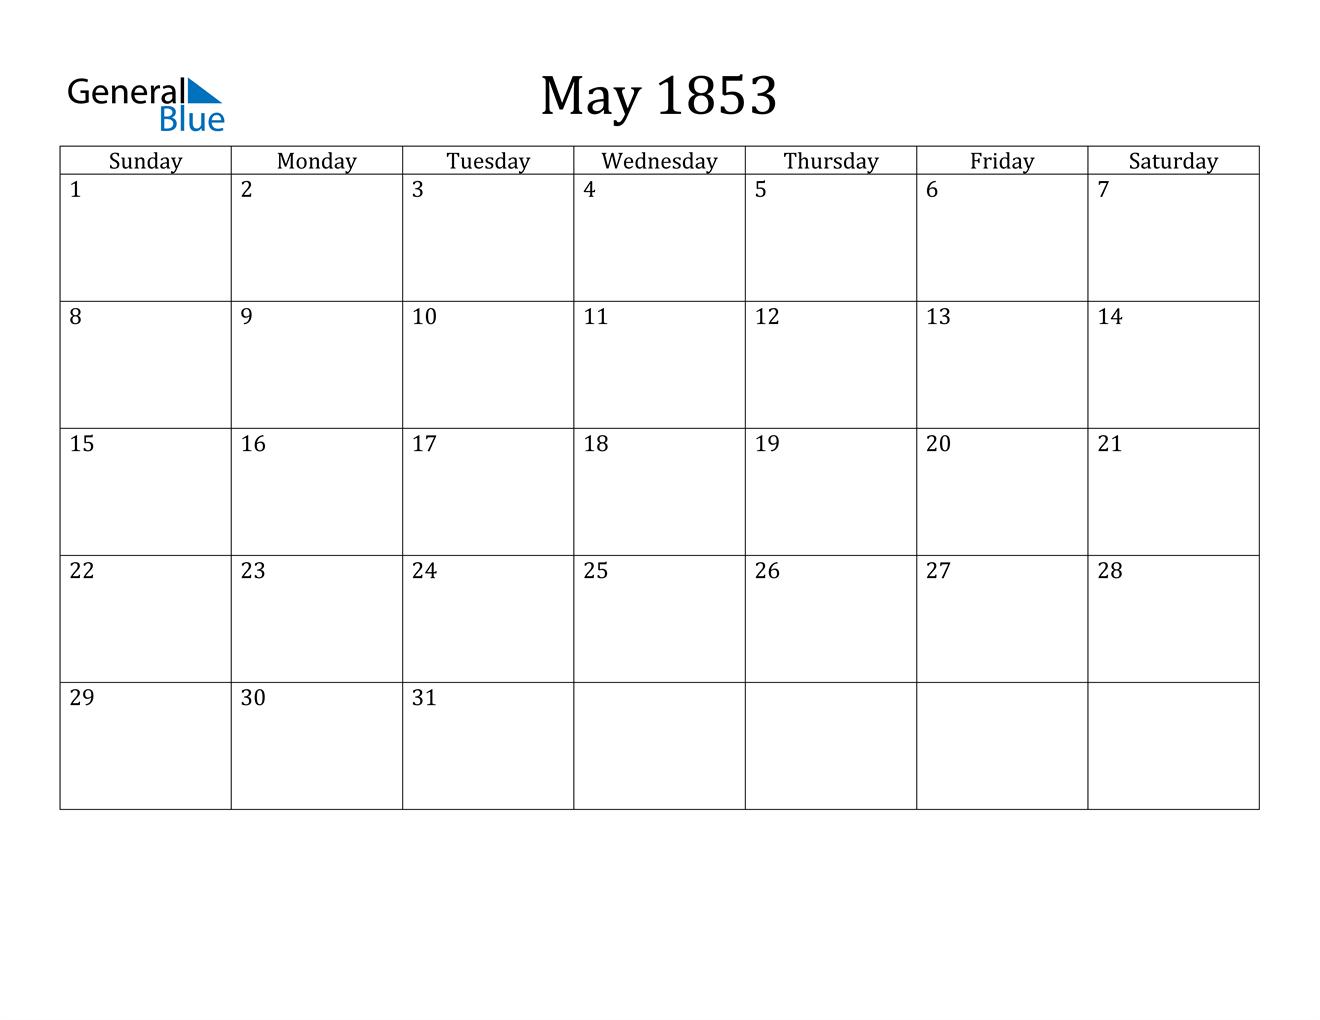 Image of May 1853 Calendar